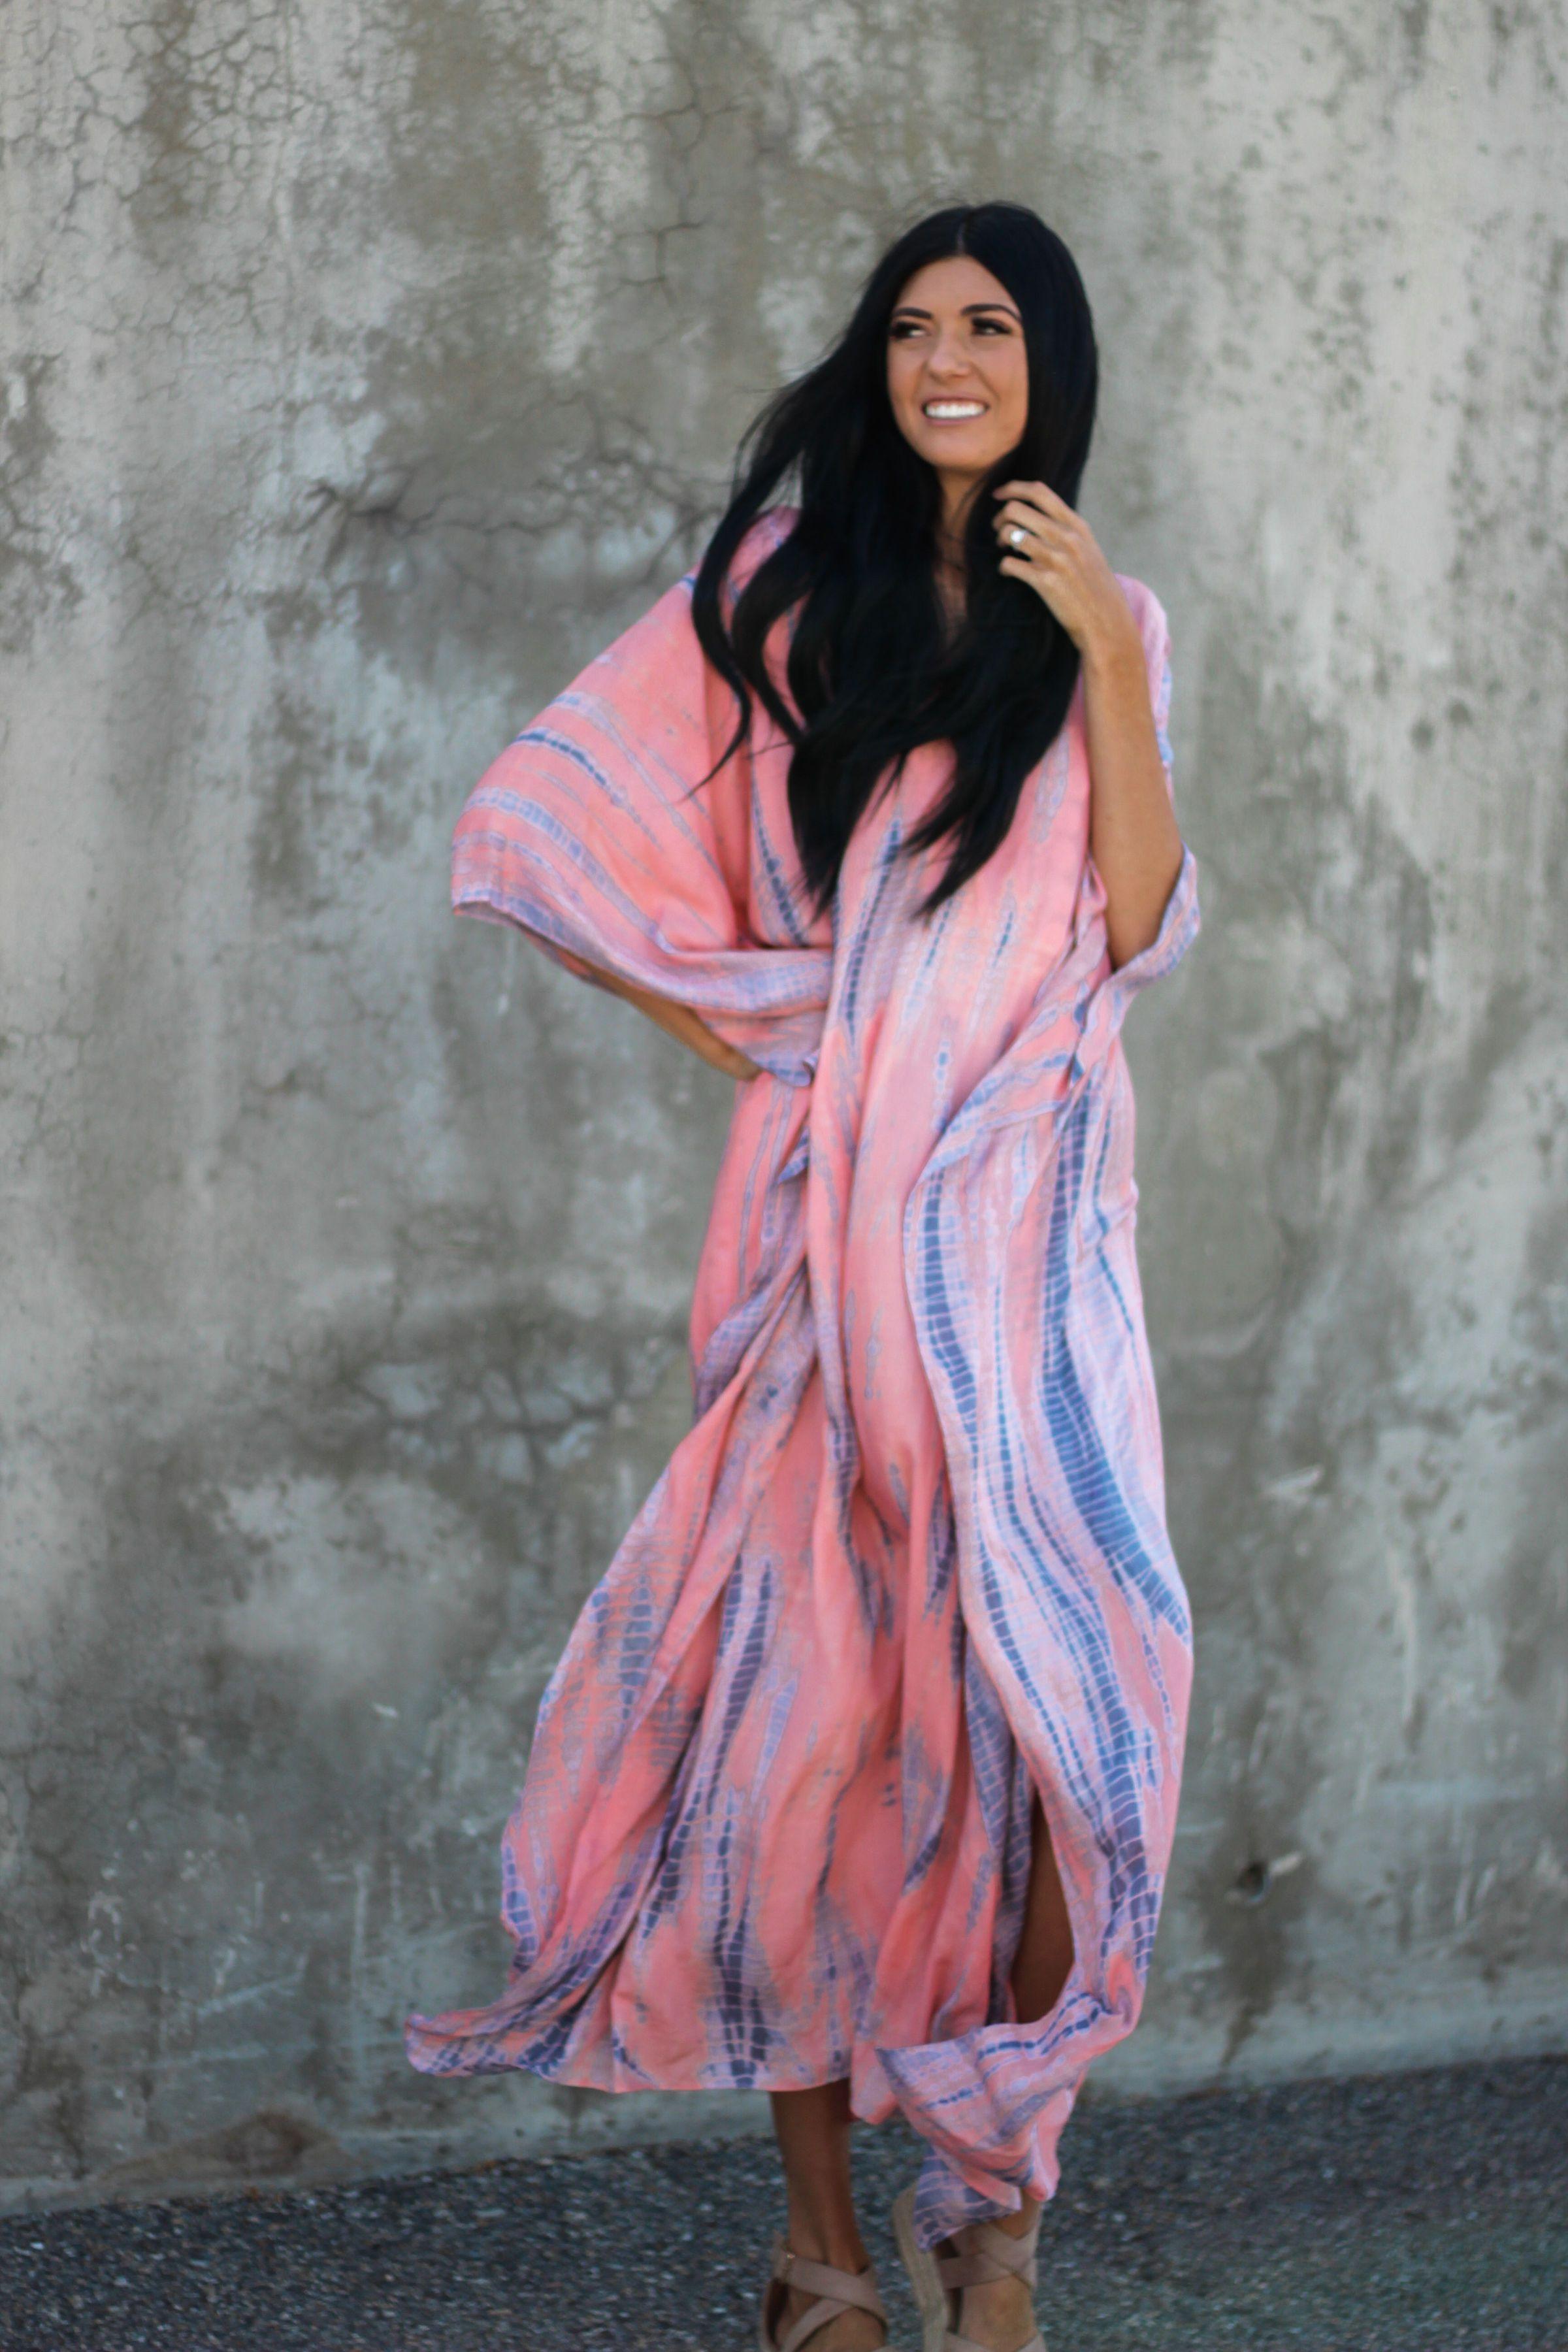 Abaya Dress Tie Dyed Kaftan Pink Maxi Dress Oversized Etsy Pink Maxi Dress Summer Party Dress Cocktail Dresses With Sleeves [ 3600 x 2400 Pixel ]